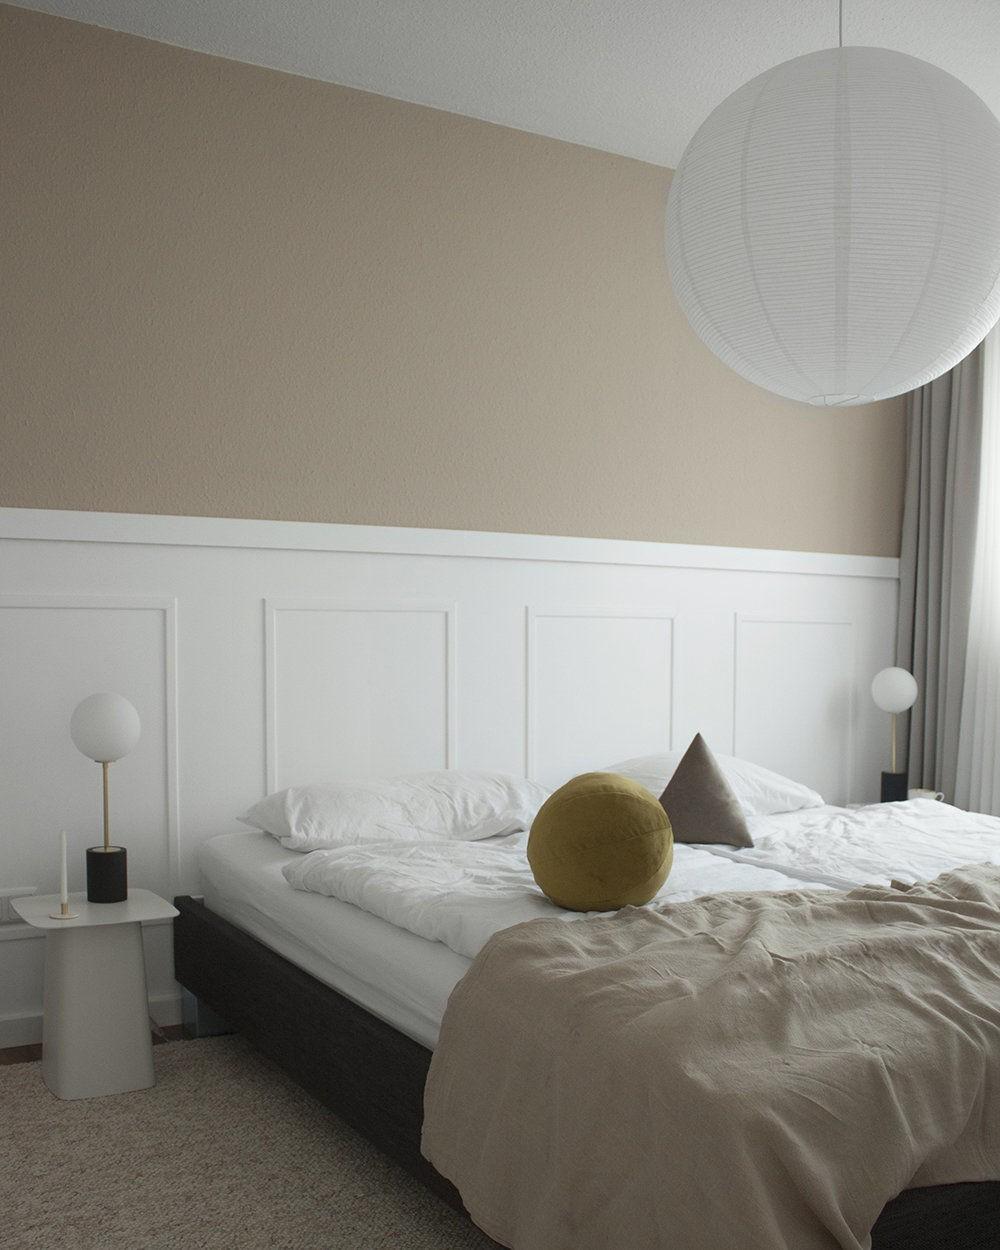 Top 8 Interior Designers From Basel interior designer Design Hubs Of The World – Amazing Interior Designers From Basel zwey